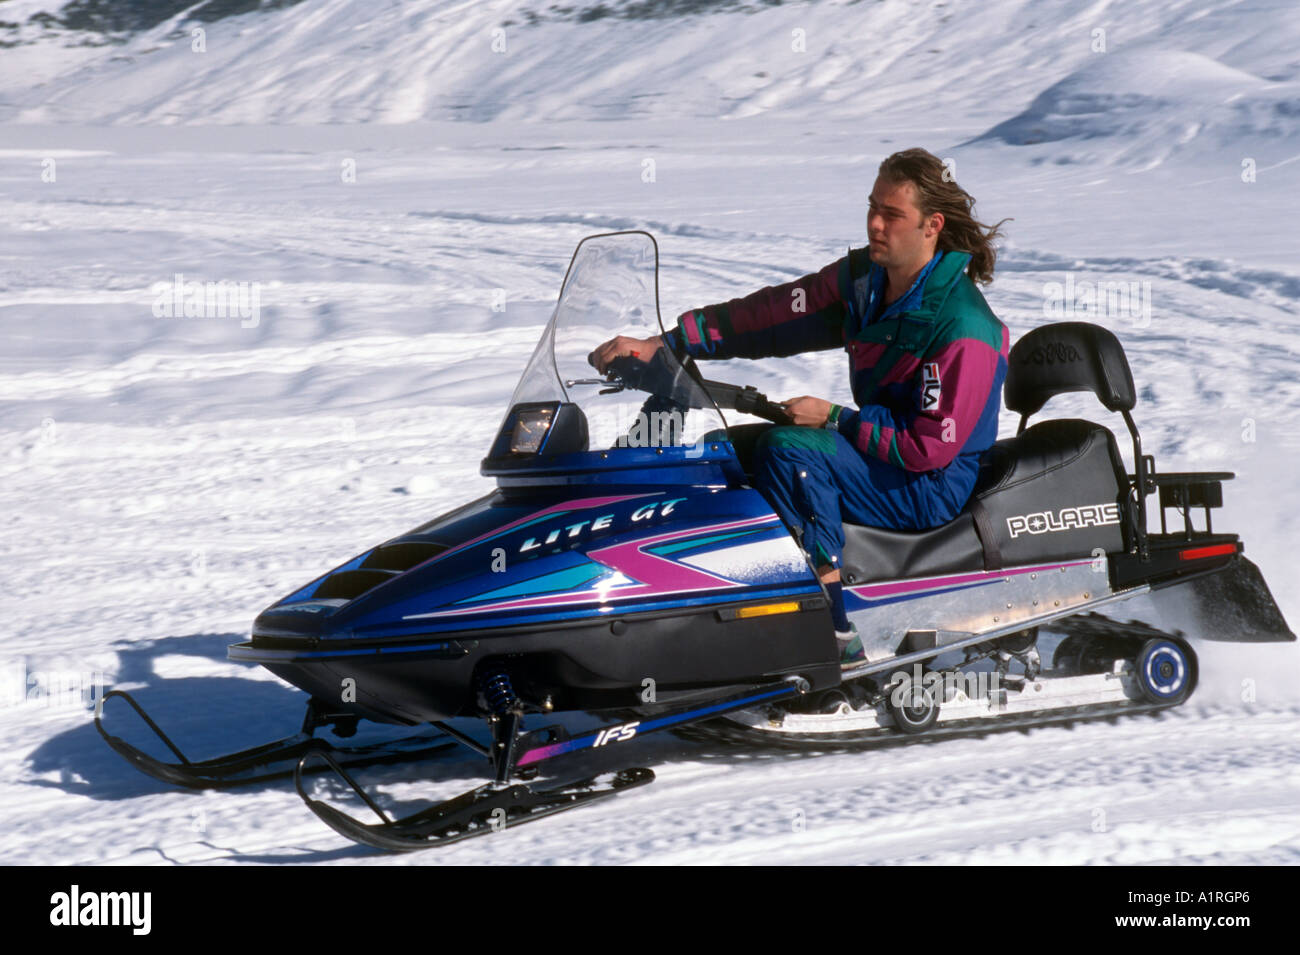 Snowmobile, Livigno, Italian Alps, Italy Stock Photo